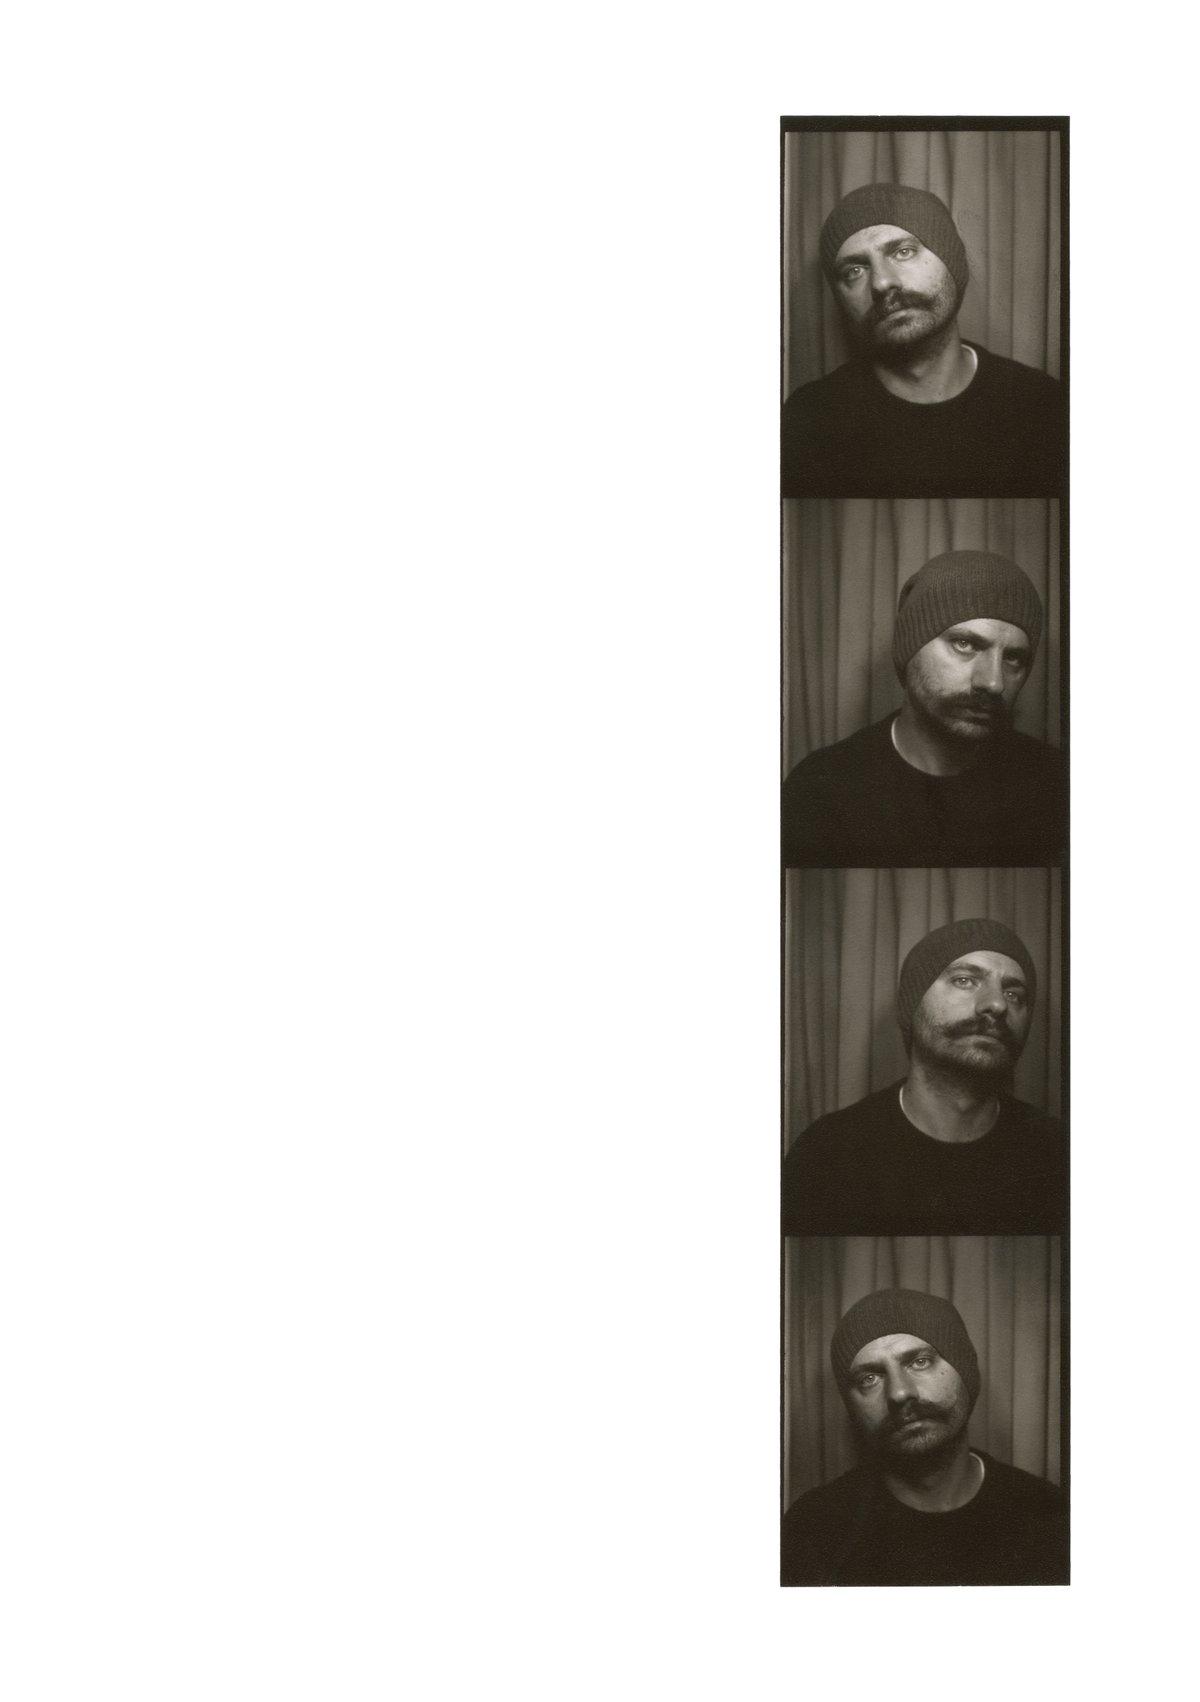 Photobooth #1 - Self-portraits Zine